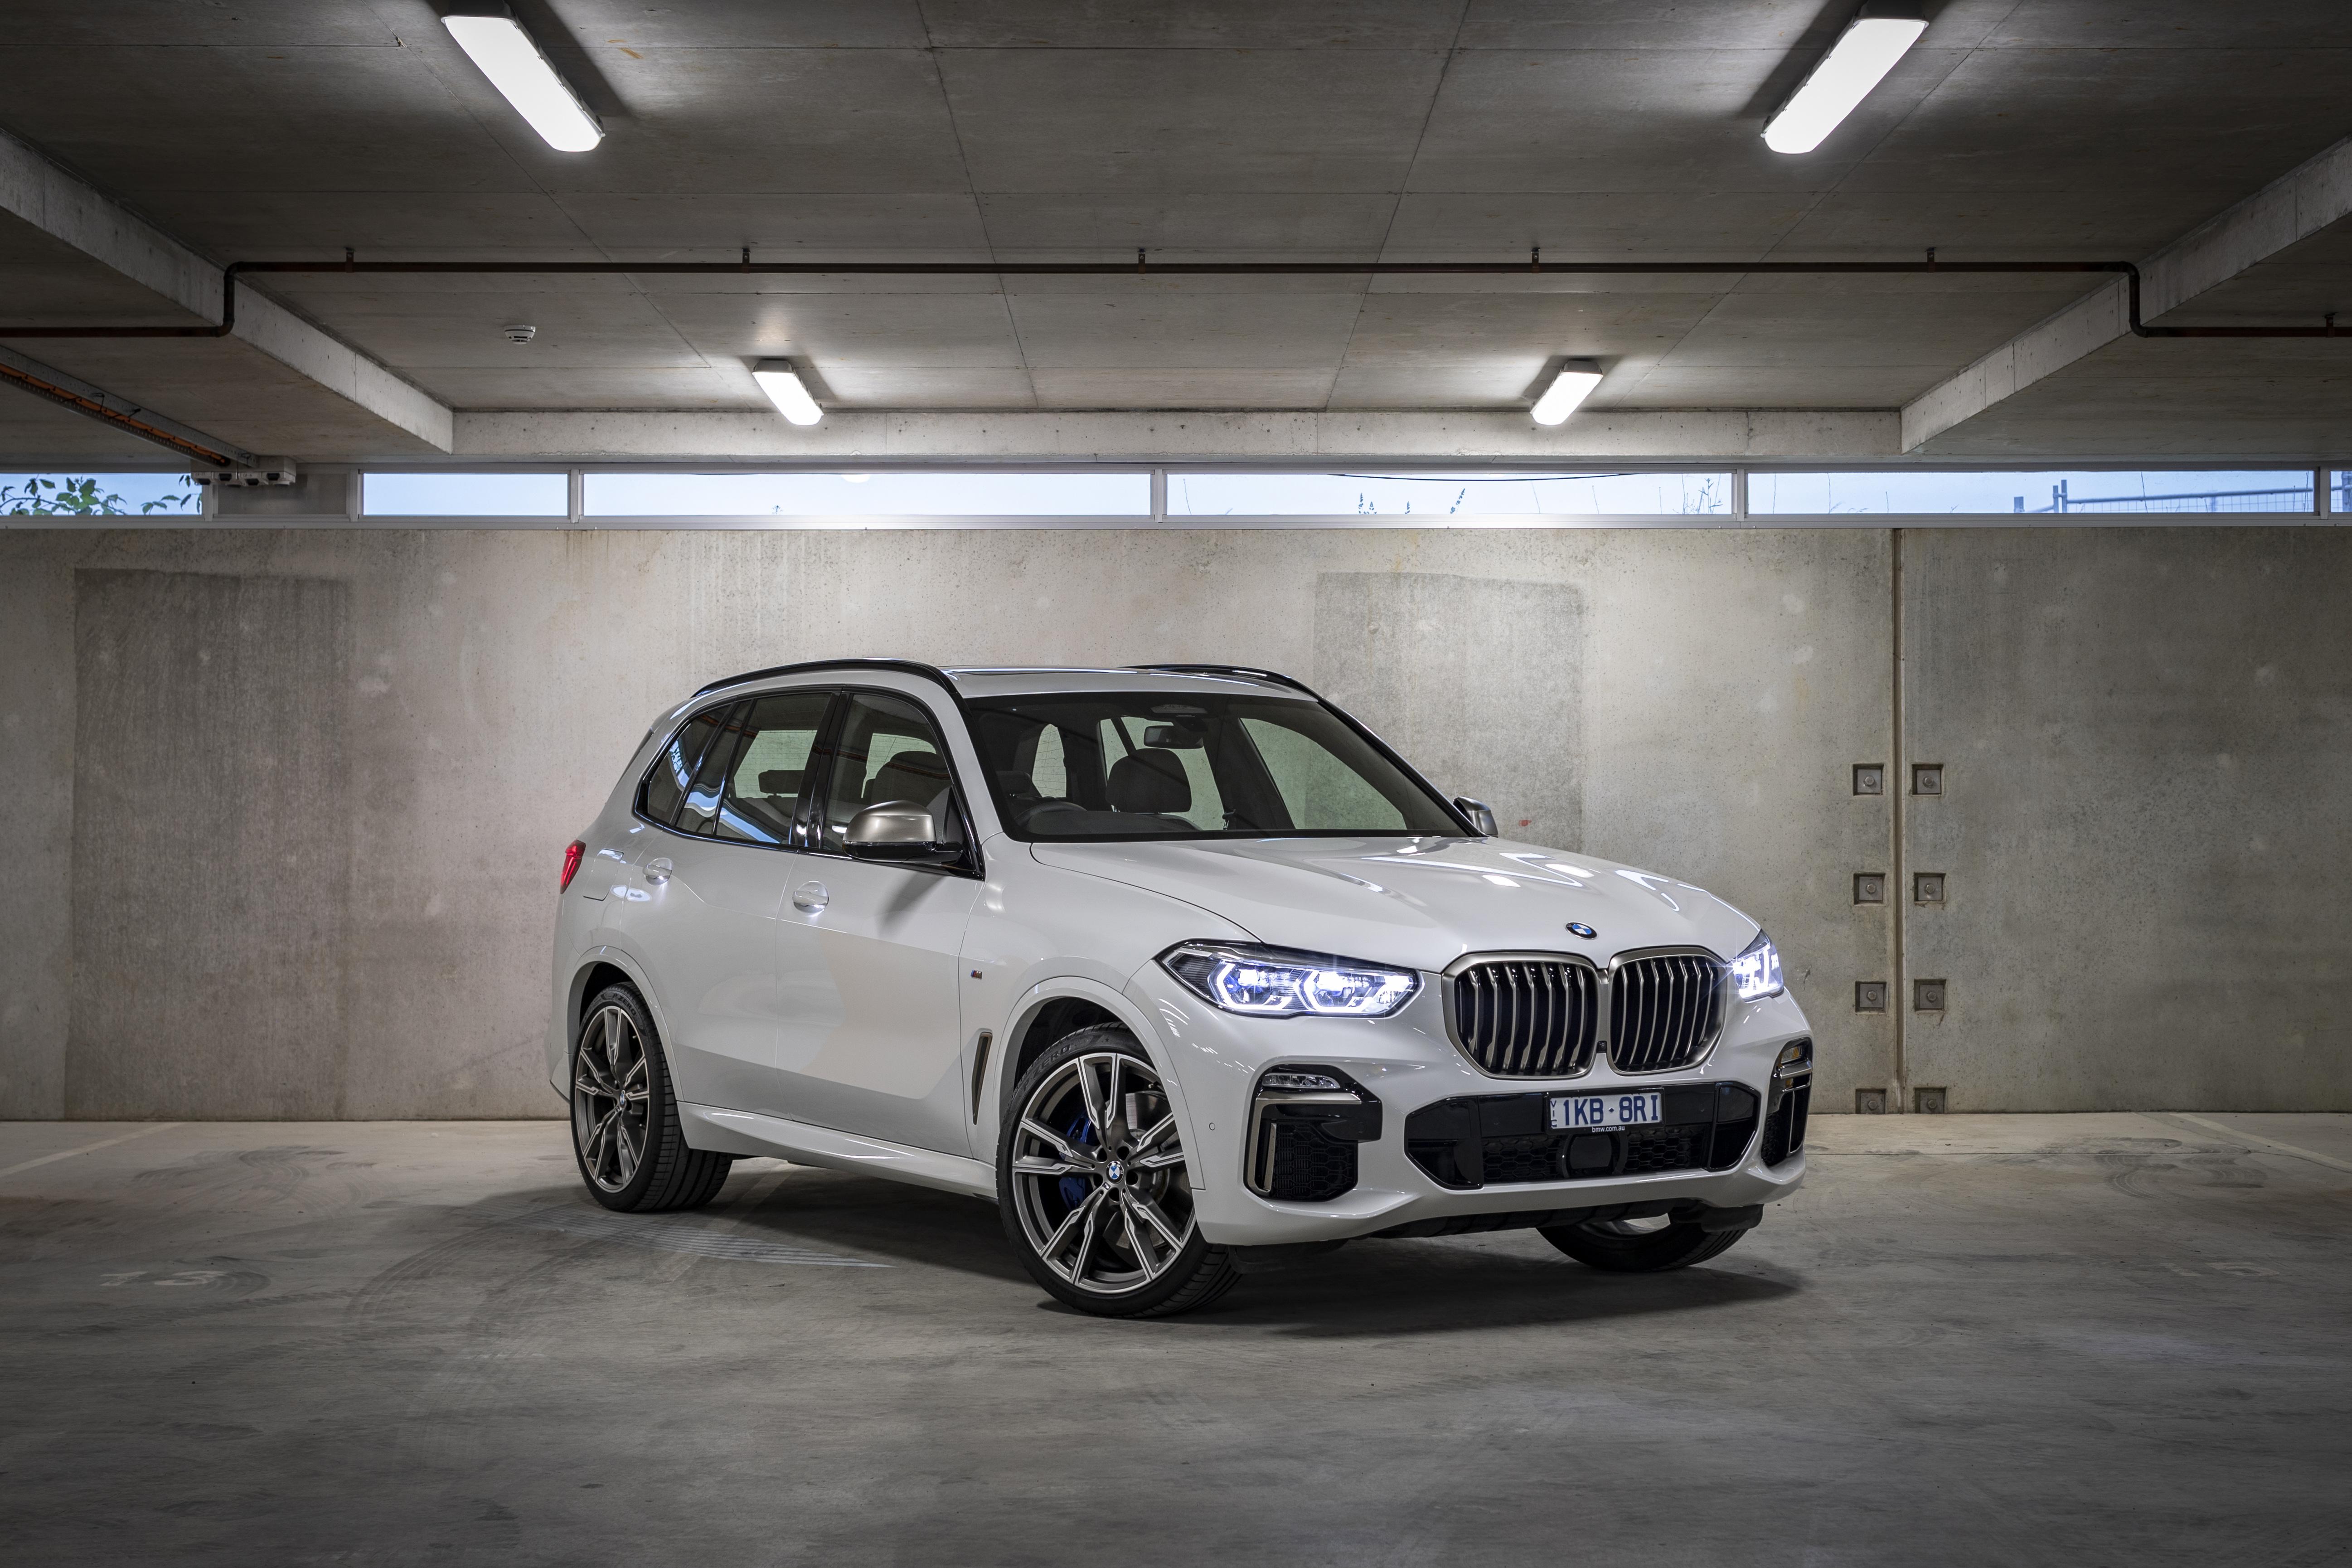 Image BMW CUV 2018-21 X5 M50d gray Cars Metallic Crossover Grey auto automobile